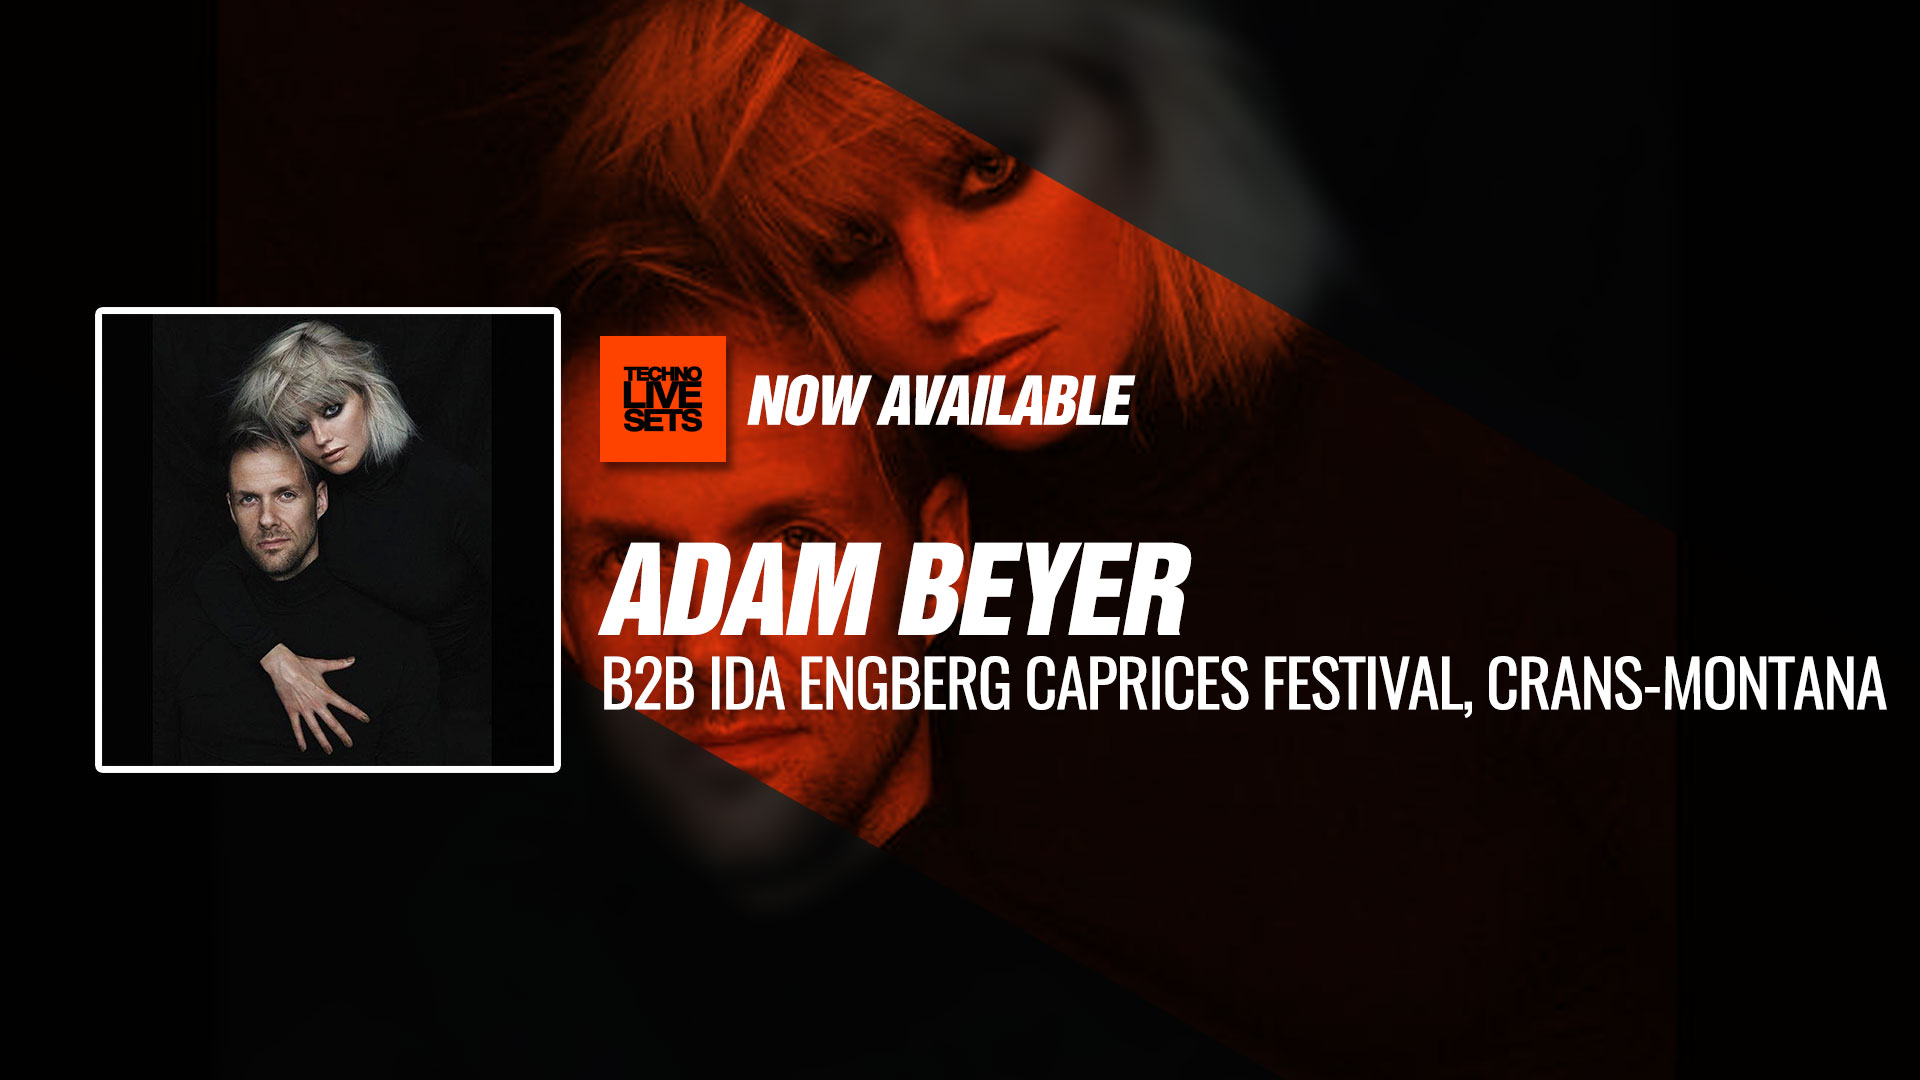 Adam Beyer B2B Ida Engberg 2018 Caprices Festival, Crans